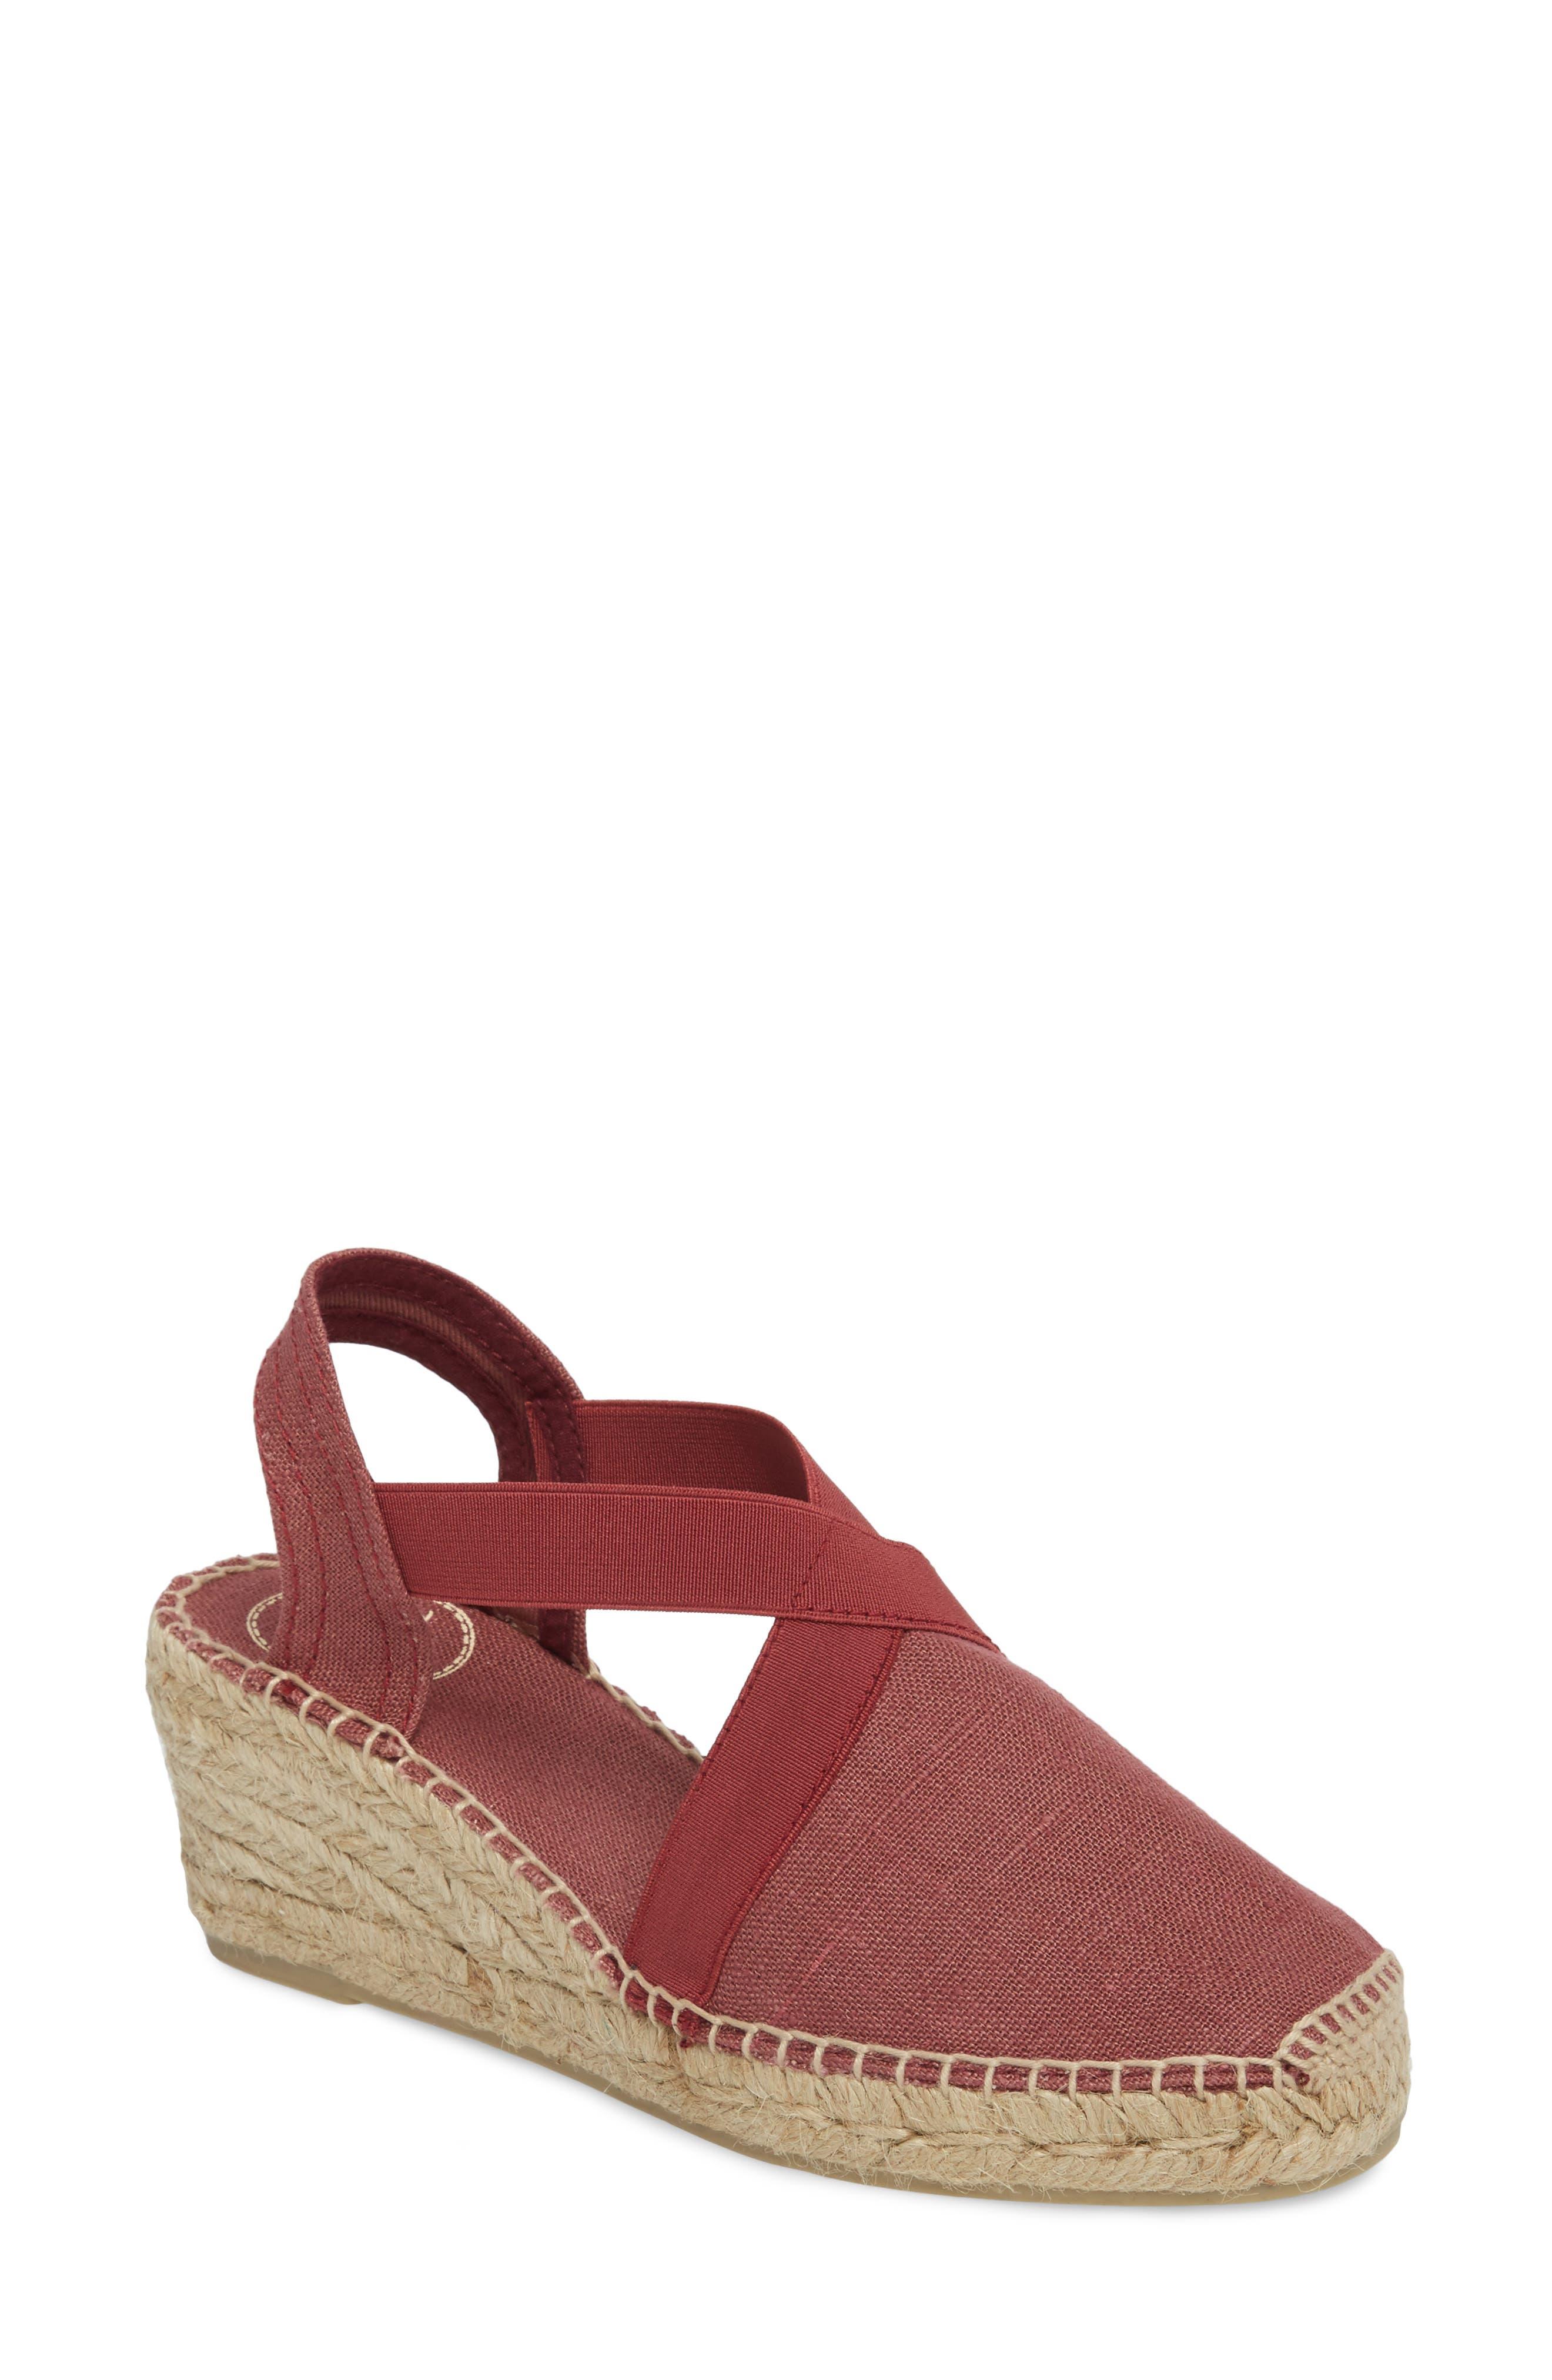 'Ter' Slingback Espadrille Sandal,                         Main,                         color, BRU FABRIC